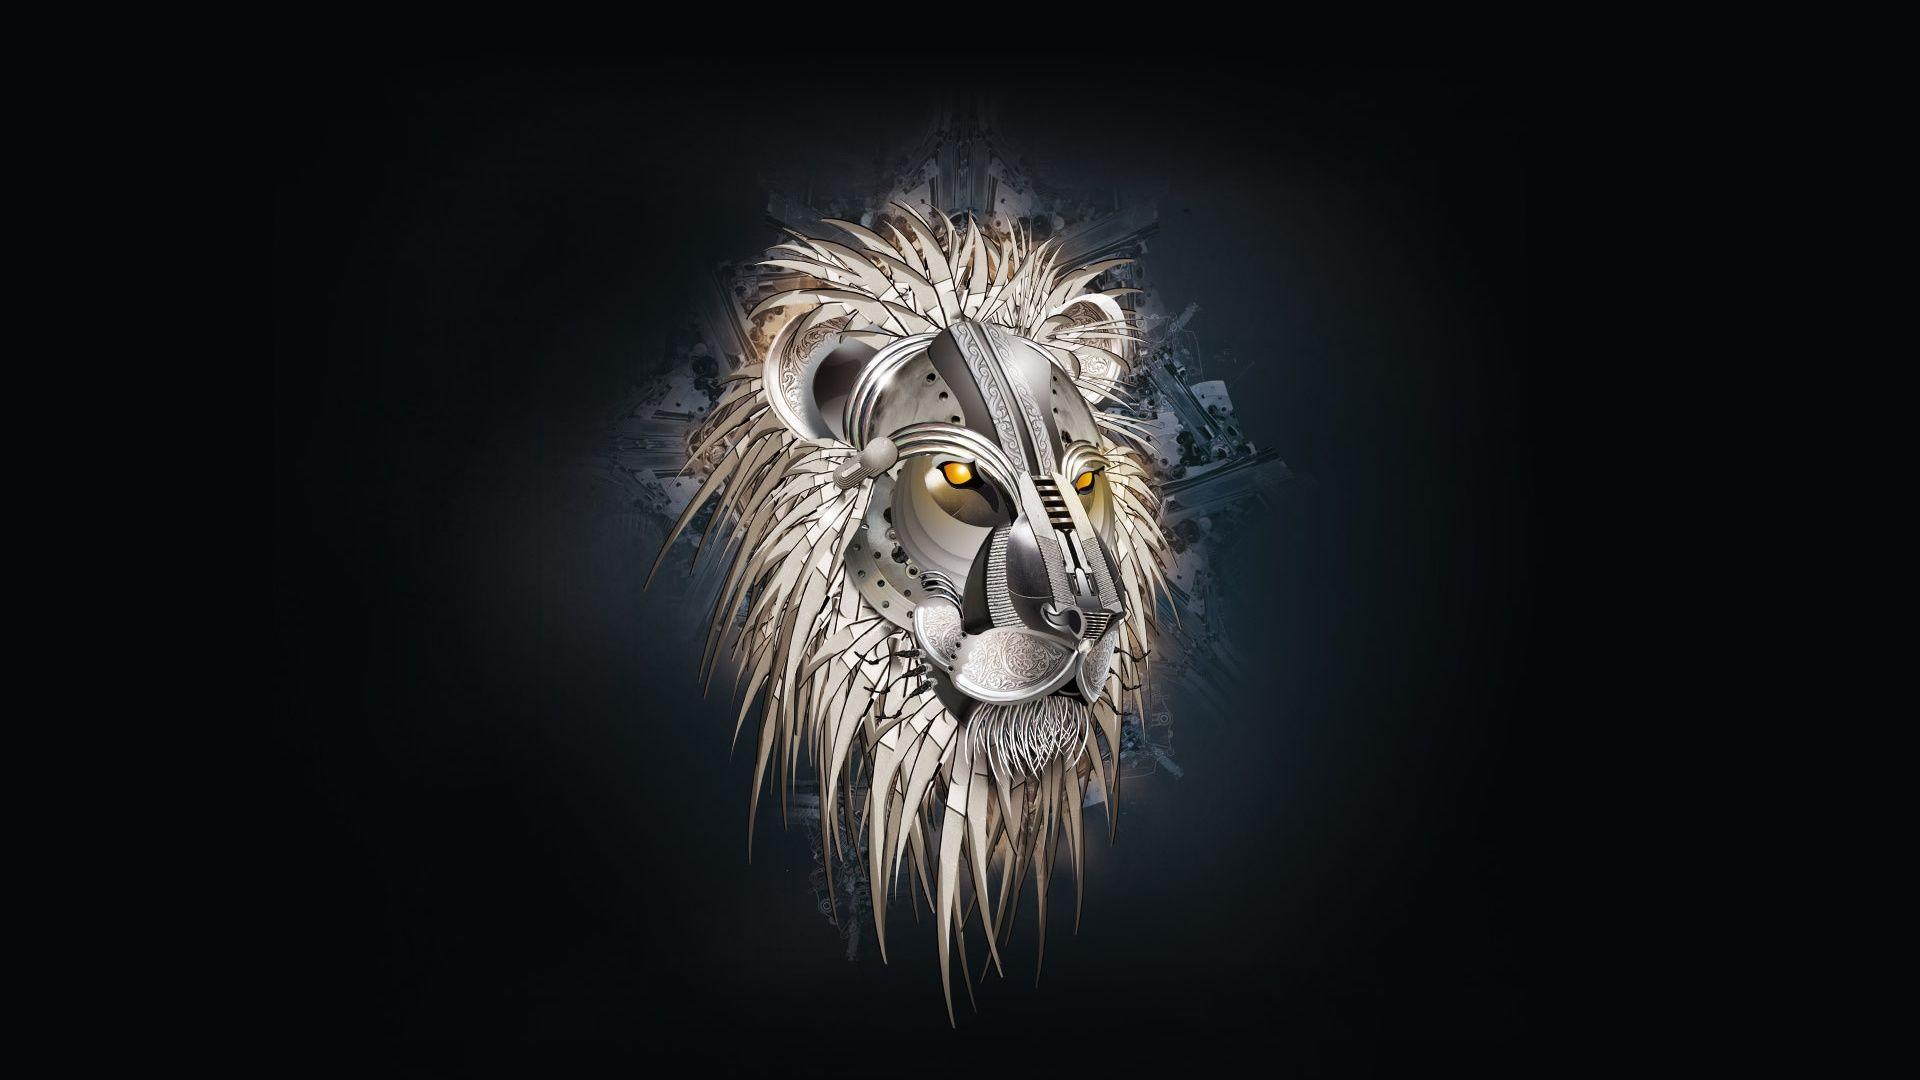 Mechanical King Lion Wallpaper Lion Hd Wallpaper Abstract Lion